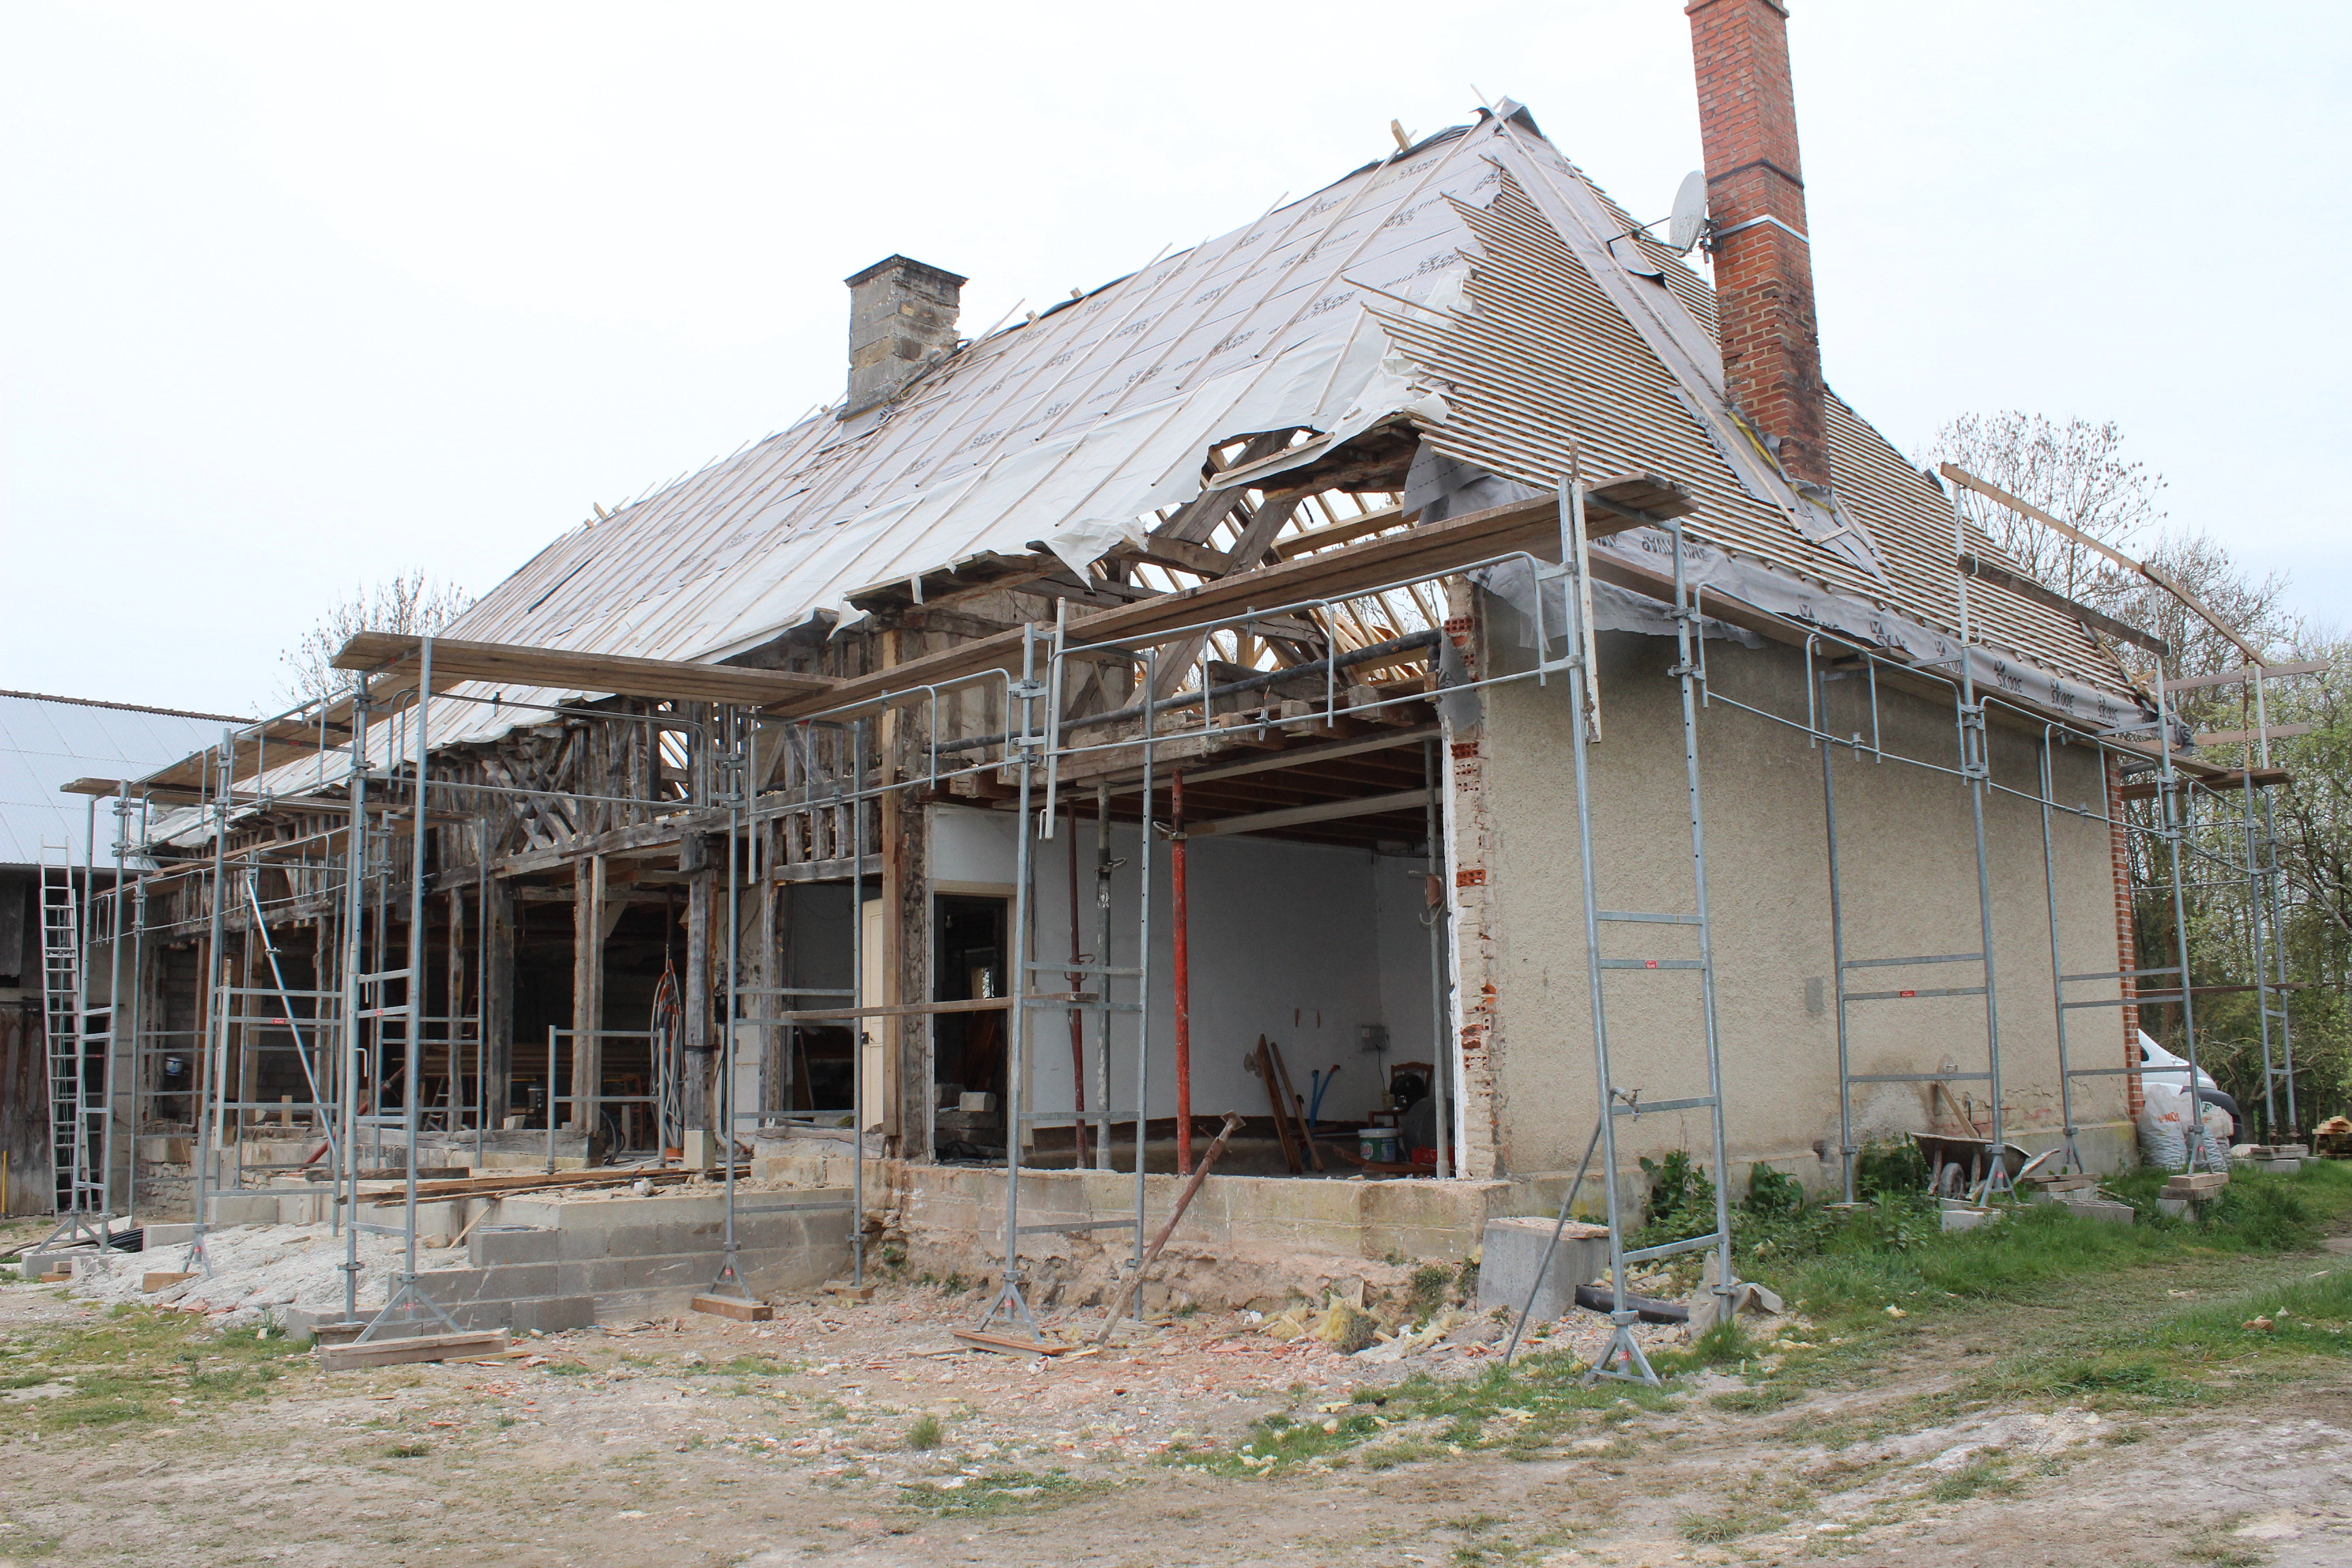 Maison avant travaux façade avant